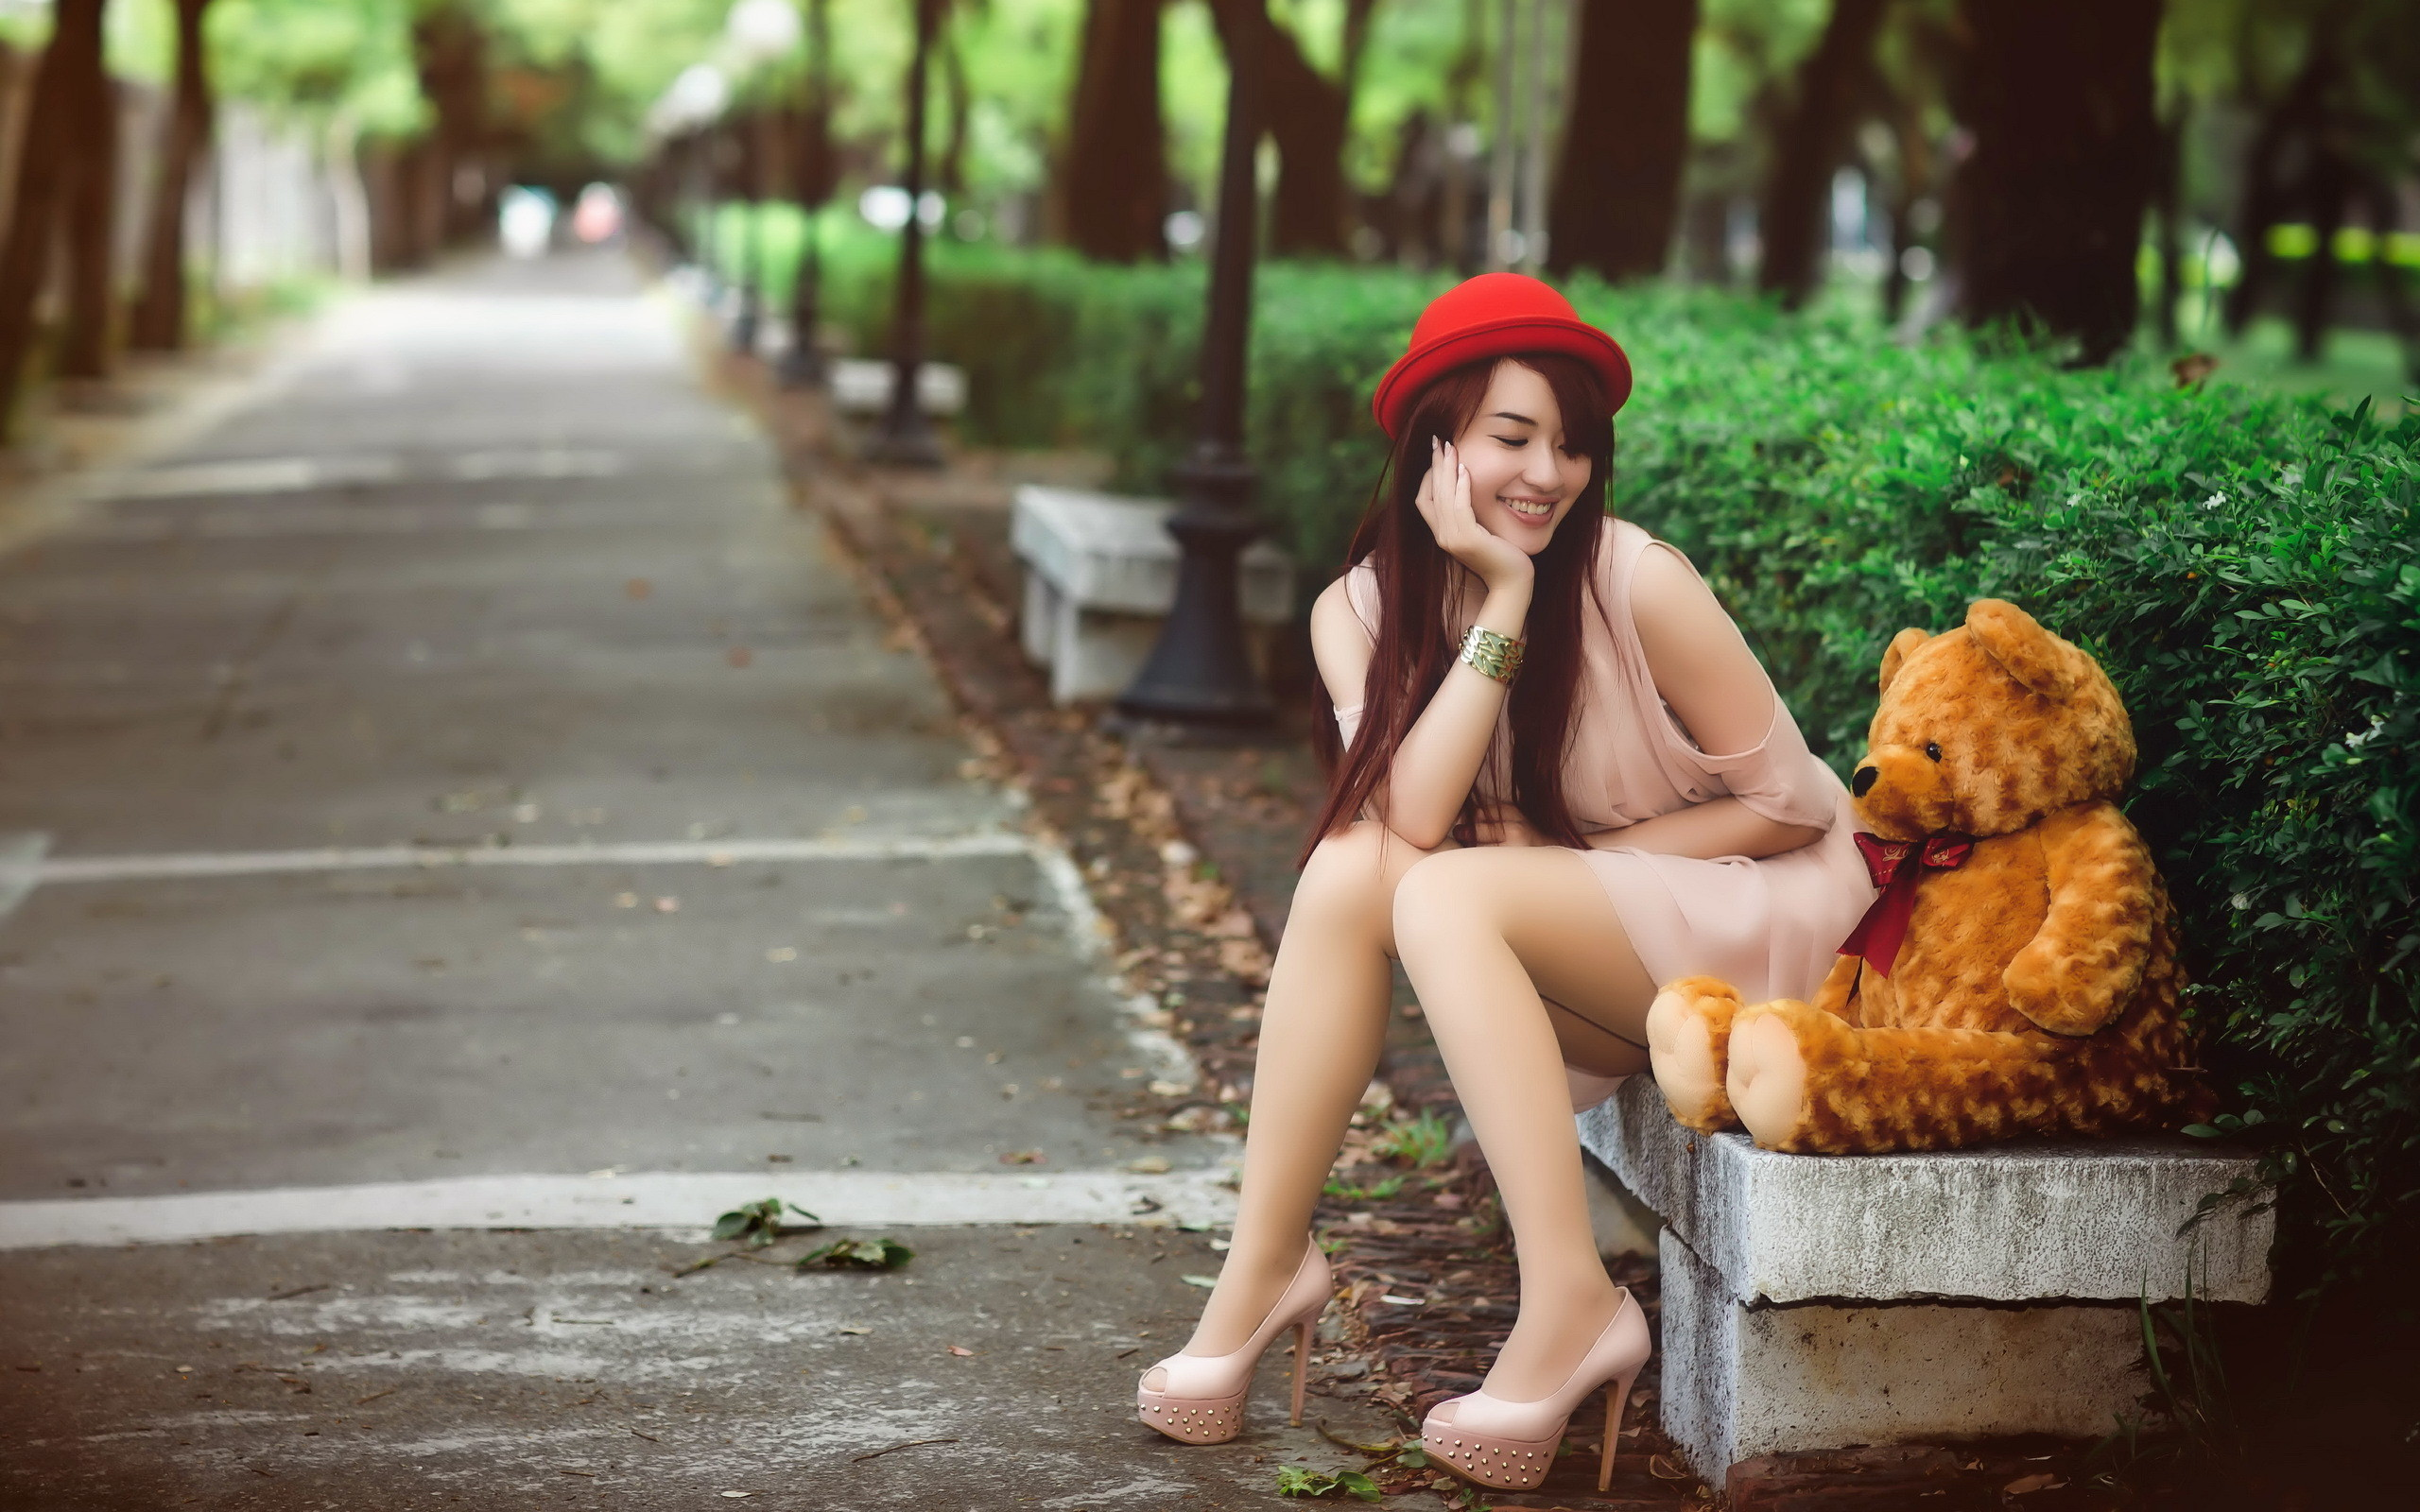 Pretty Girl With Teddy Bear Wallpaper